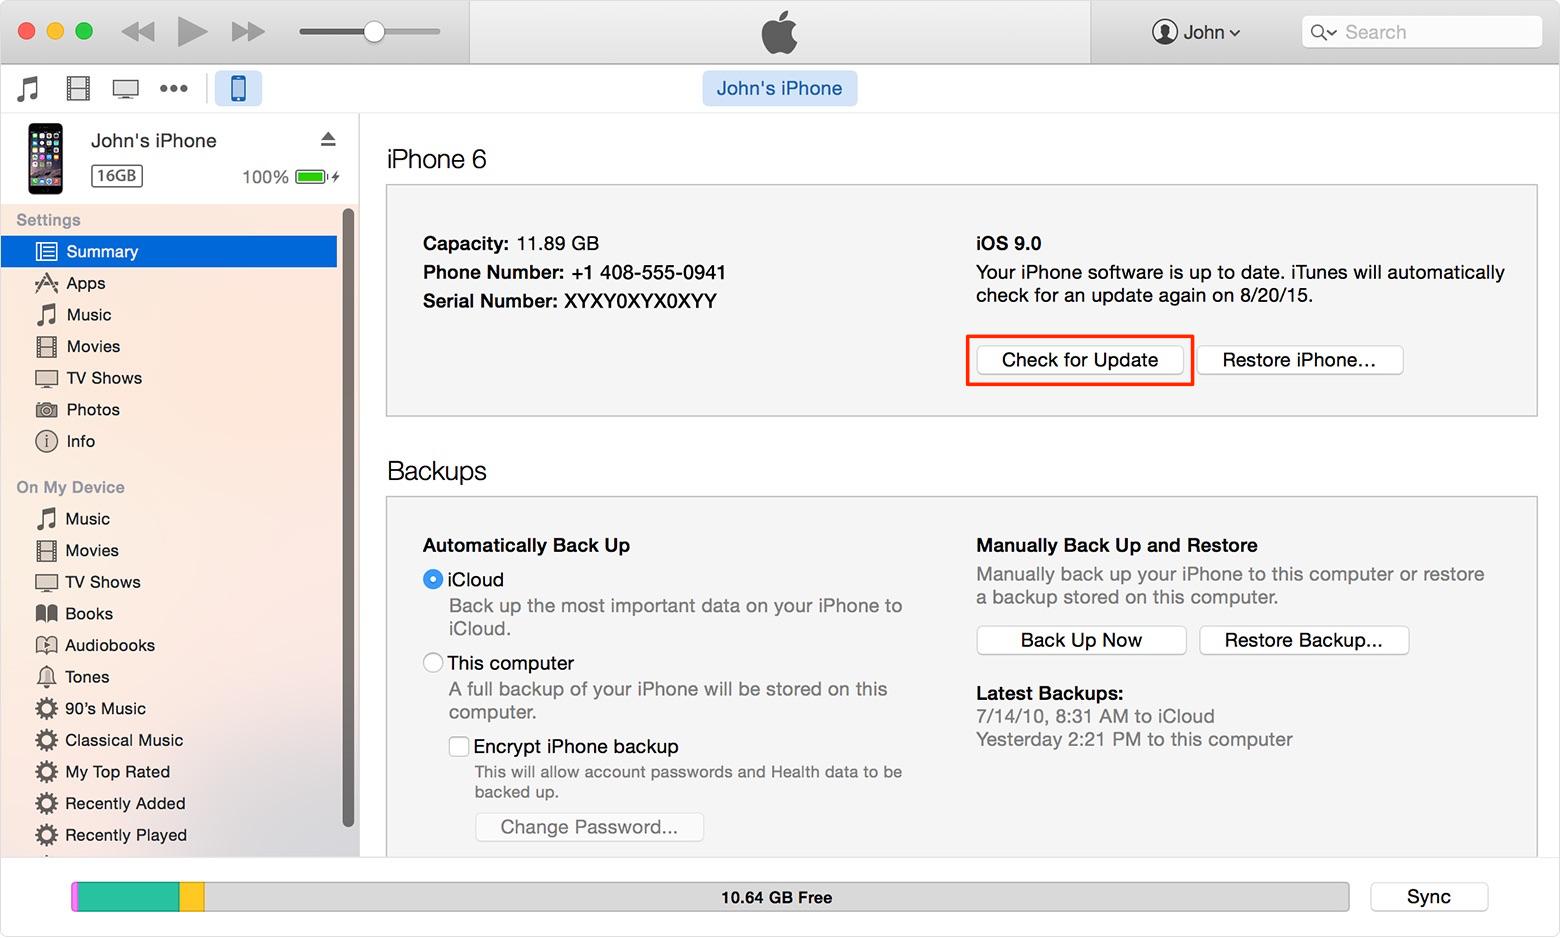 Install iOS 10 on iDevice via iTunes